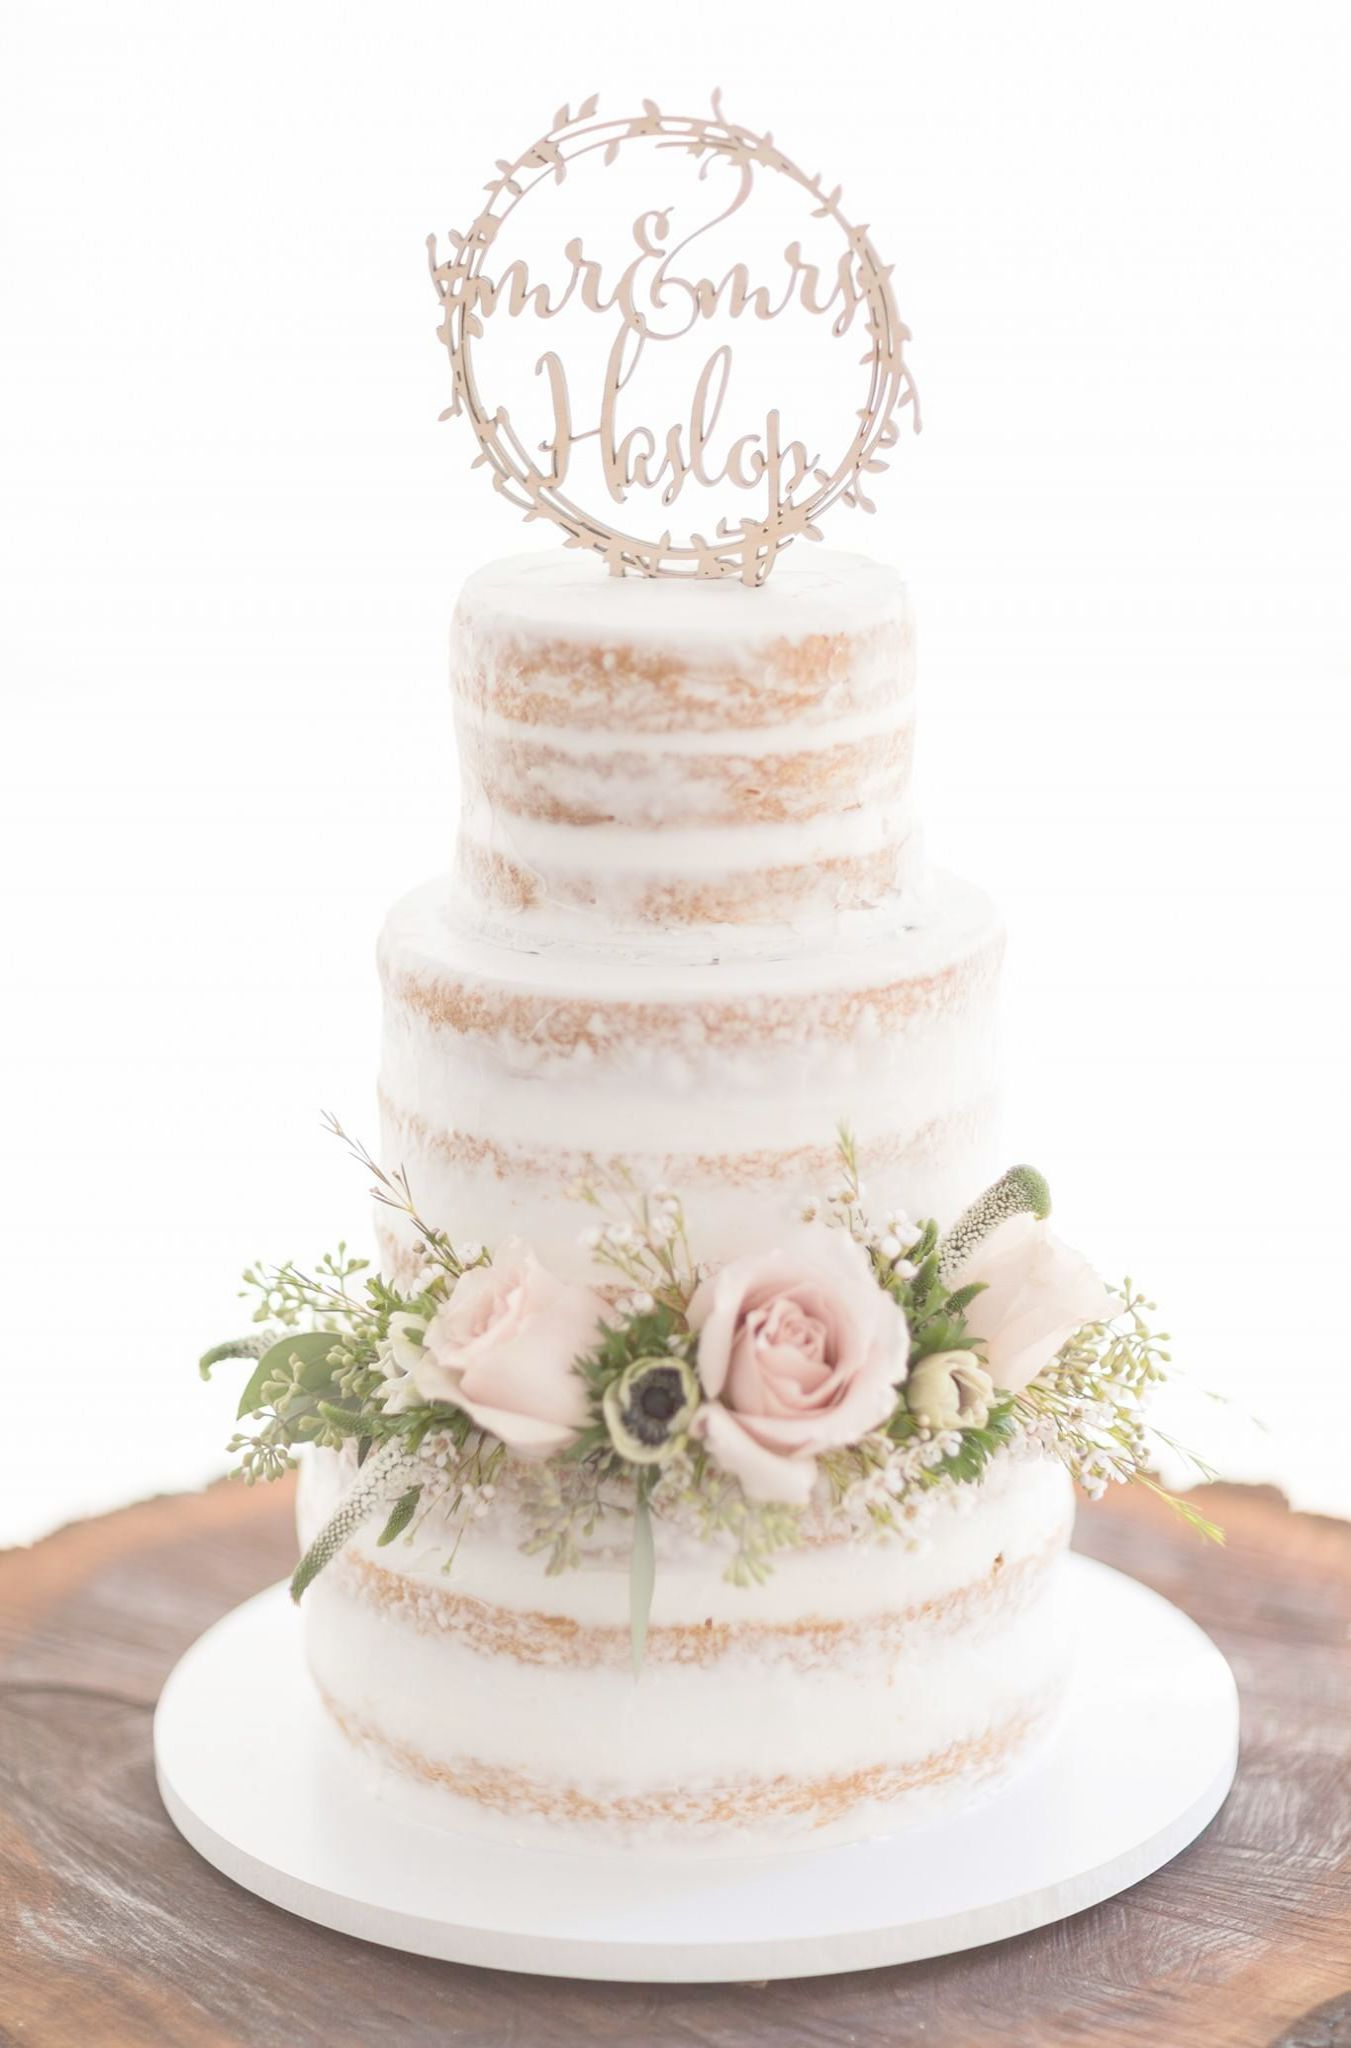 Wedding Rings Male This Wedding Cake Ideas Teal Behind Wedding Cakes Bakery Near Me Amid Wedding C Blush Wedding Cakes Wedding Cake Rustic Floral Wedding Cakes